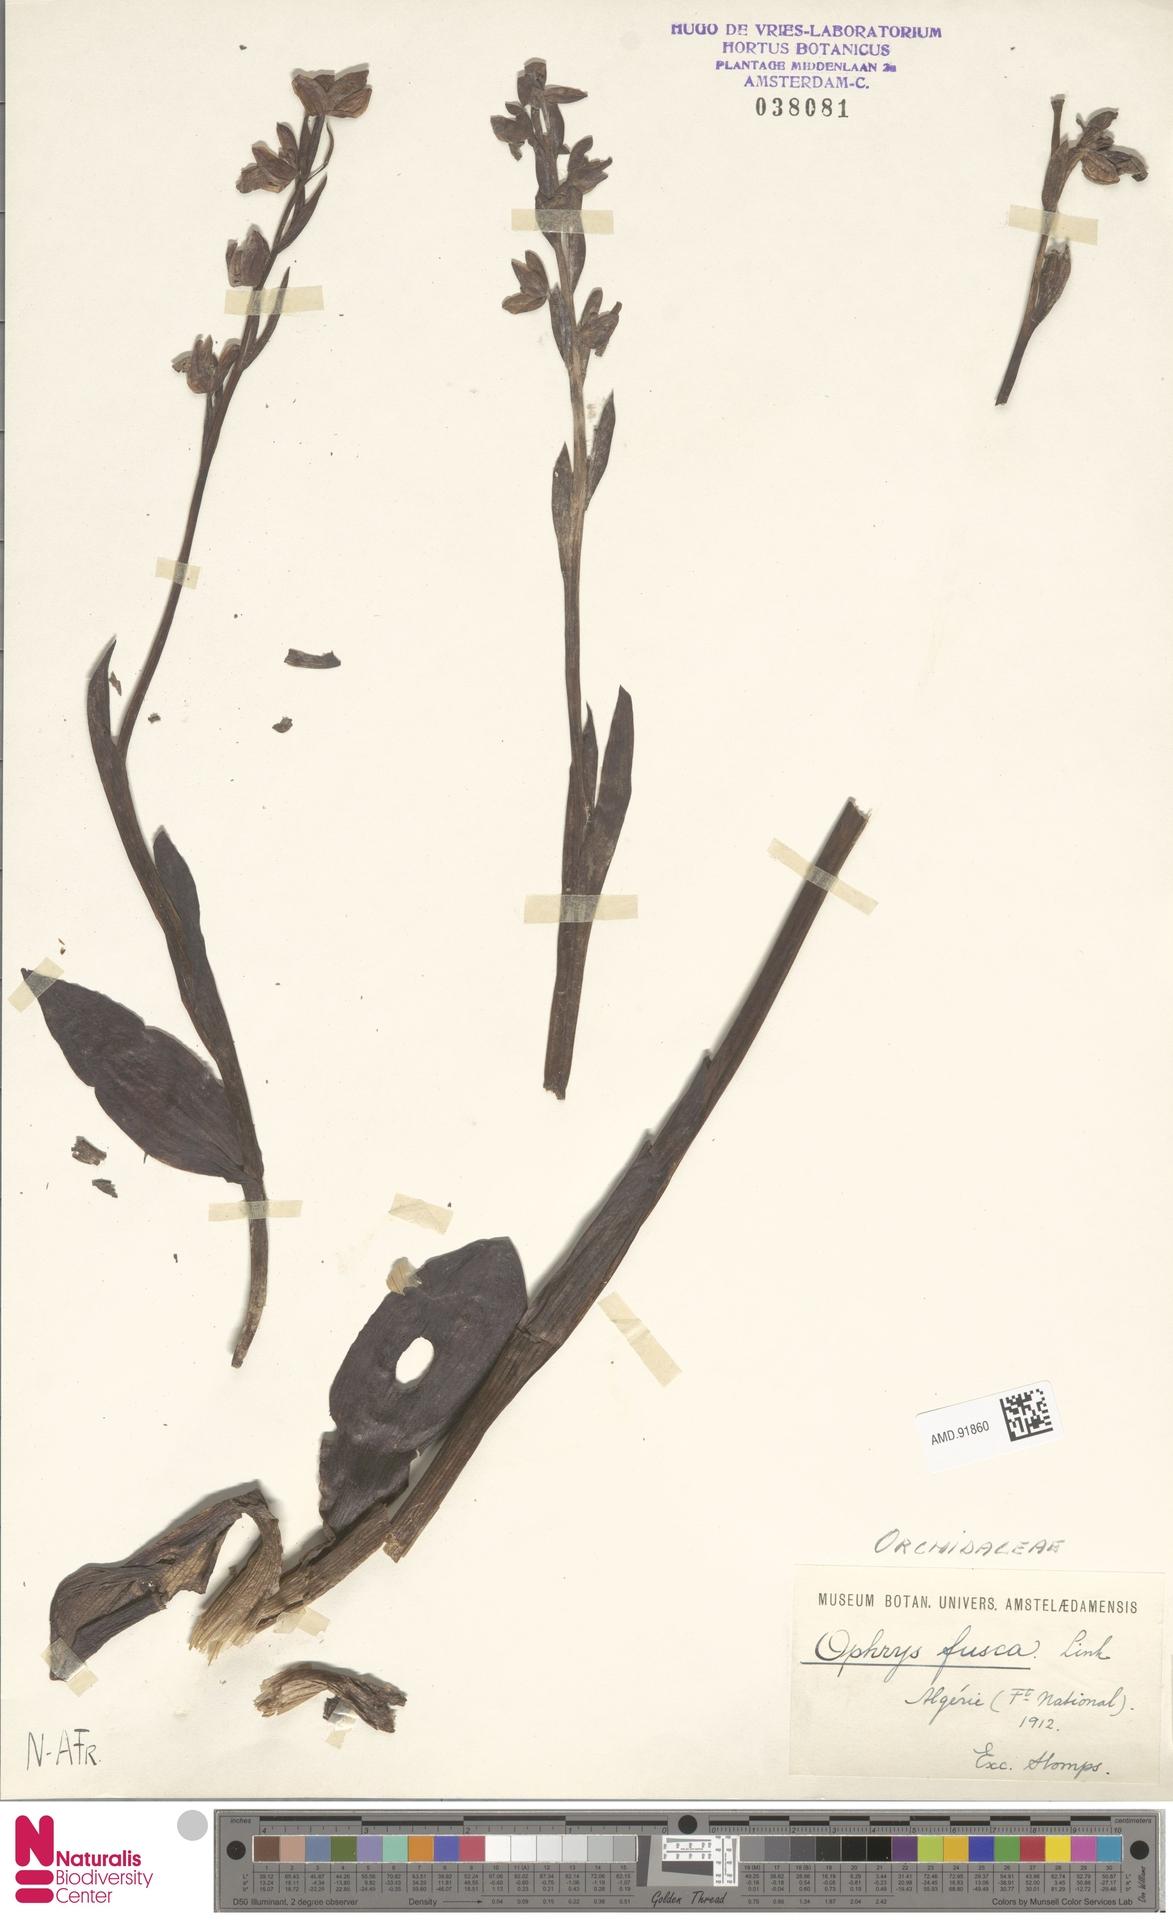 AMD.91860 | Ophrys fusca Link